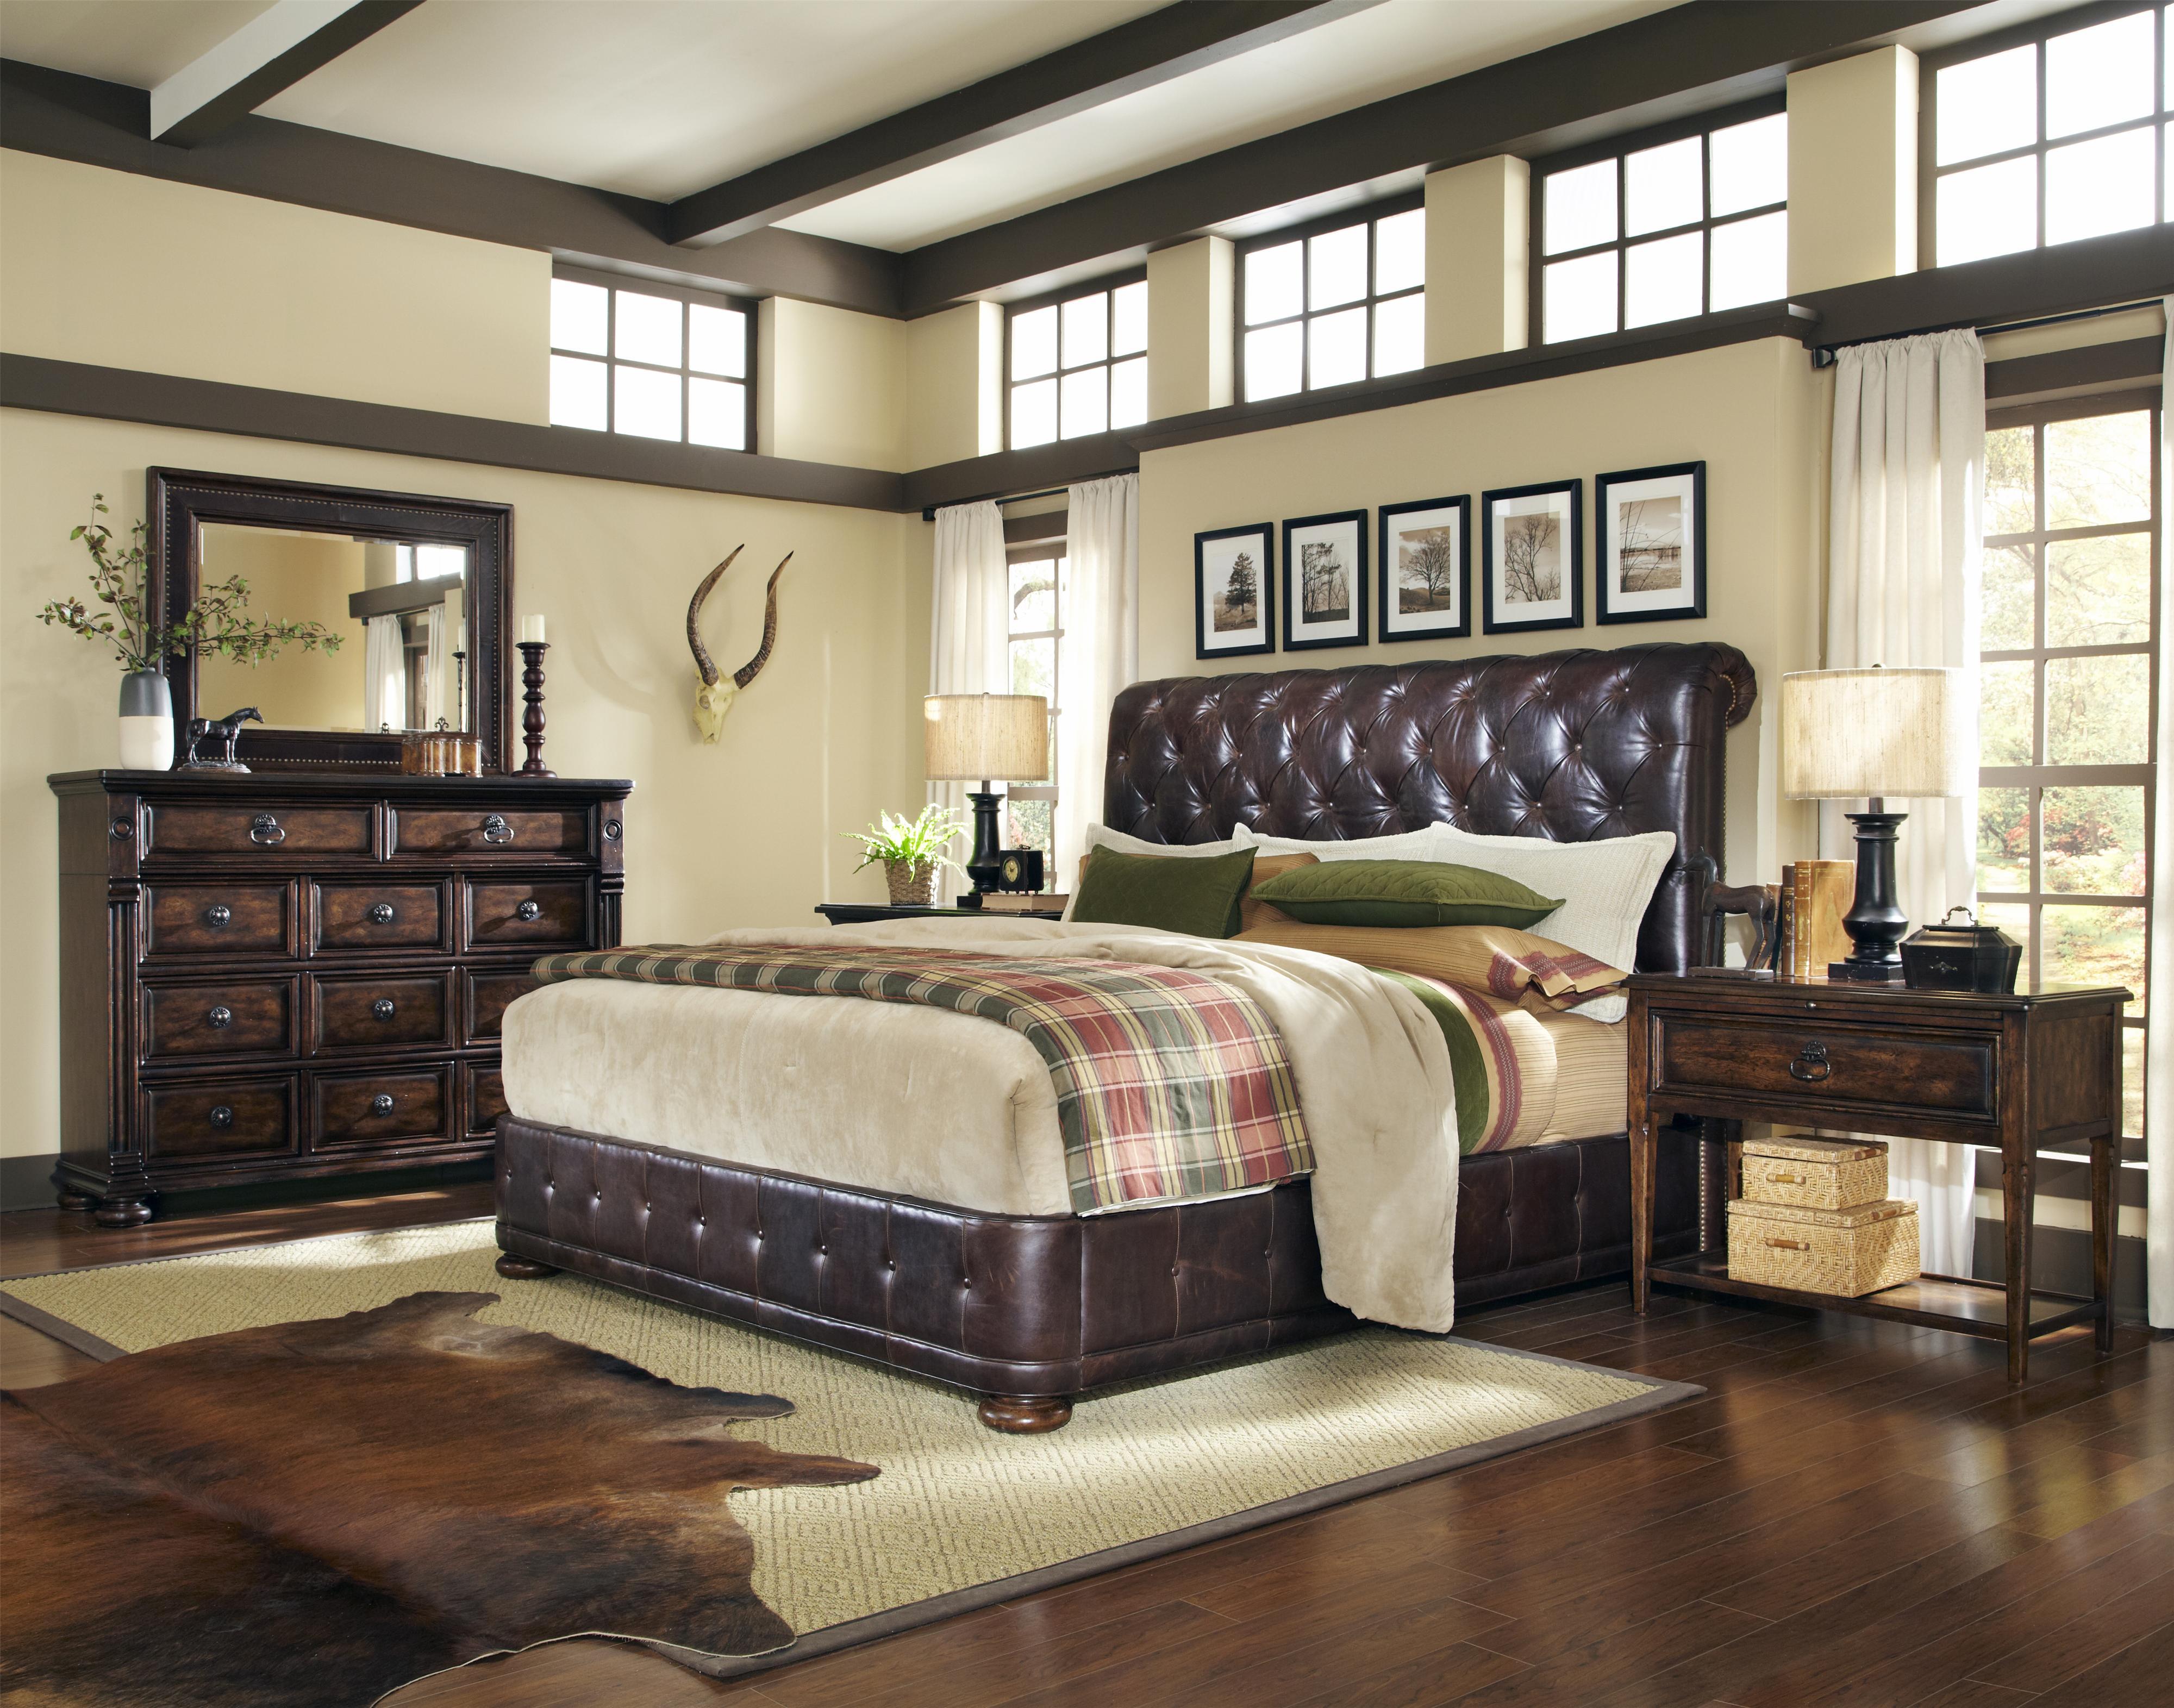 Belfort Signature Belvedere King Bedroom Group - Item Number: 205000 K Bedroom Group 2